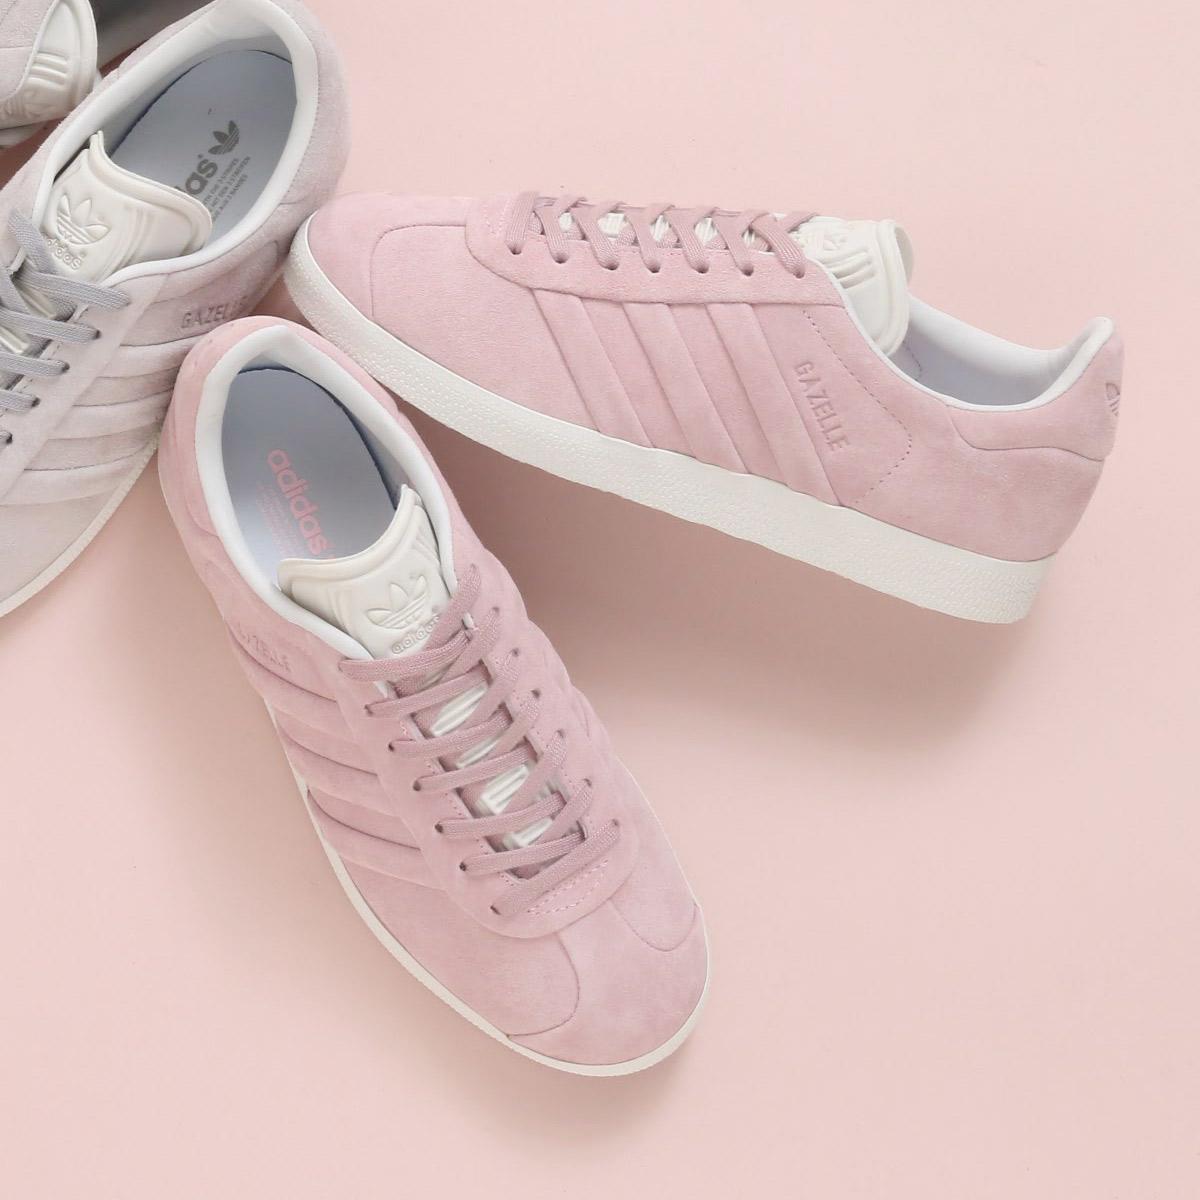 f60492f31eb28 adidas Originals GAZELLE STITCH AND TURN W (Adidas originals gazelle stitch  and turn W) (Wonder pink F10  Wonder pink F10  running white) 18SS-I